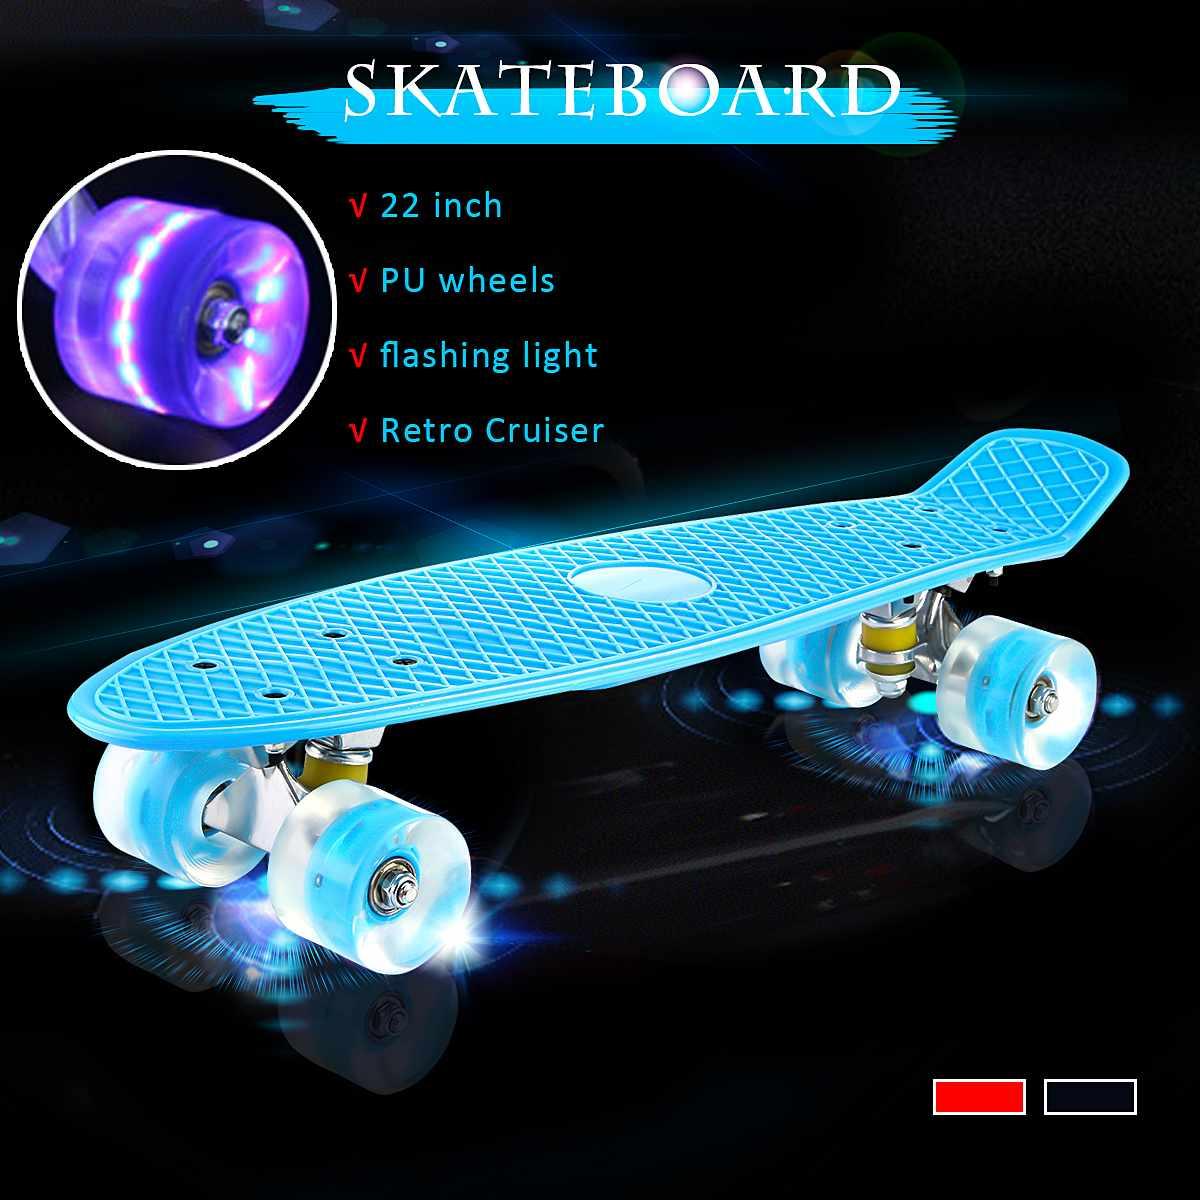 Mini Longboard de cuatro ruedas de 22 pulgadas, tabla de Skate de Color Pastel, monopatín con ruedas intermitentes LED, monopatín Retro